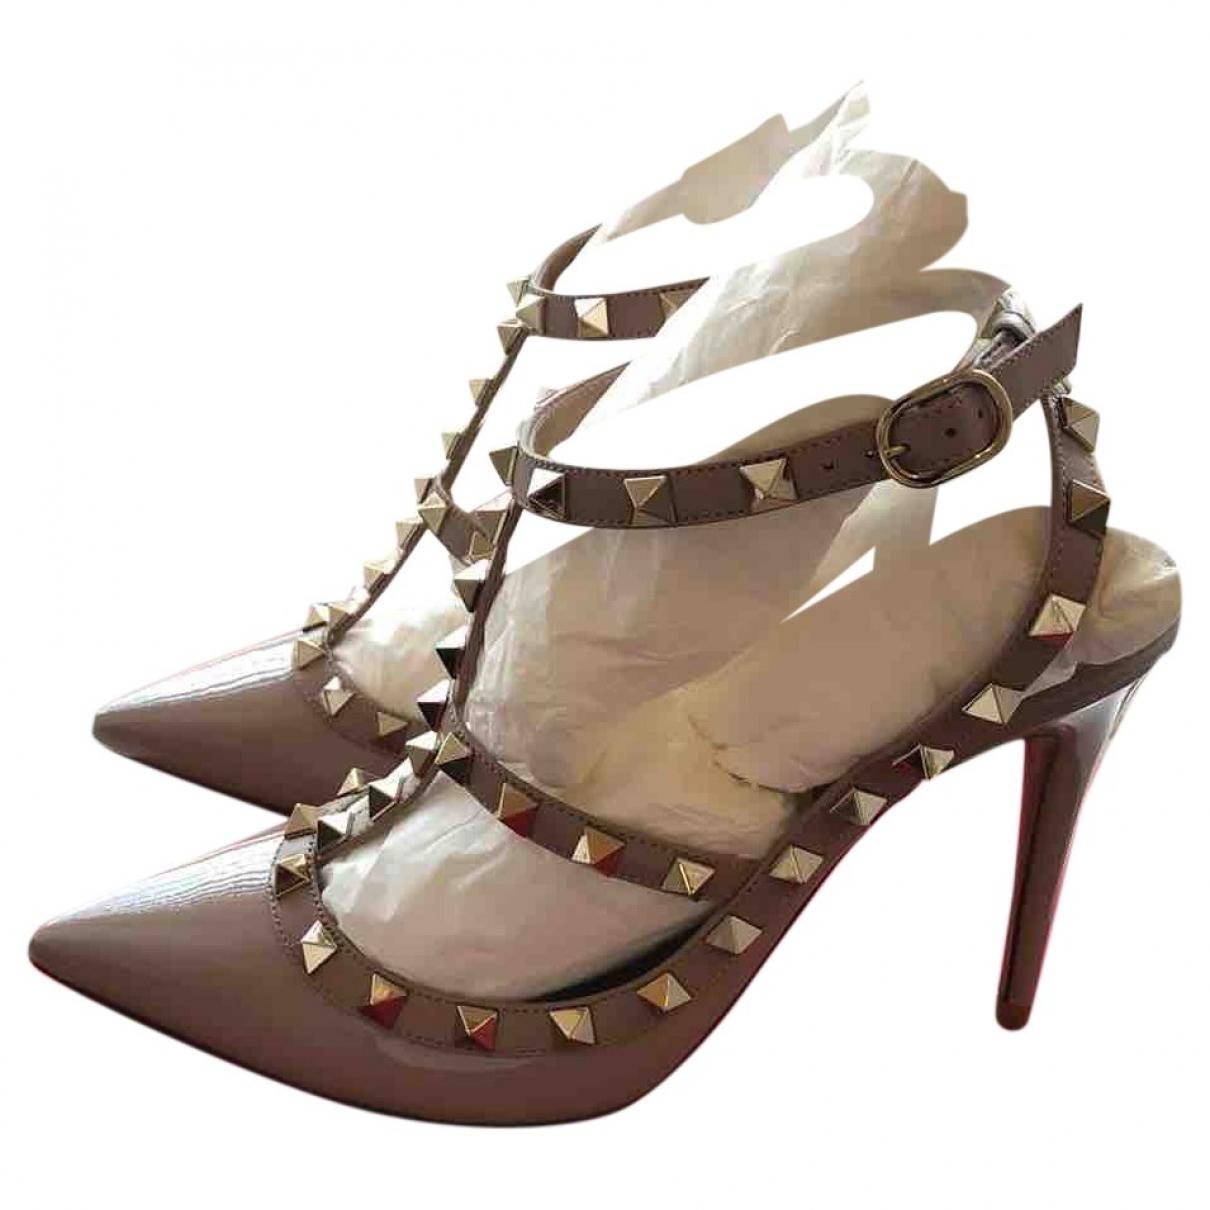 Valentino Garavani Rockstud Beige Patent leather Heels for Women 37.5 EU